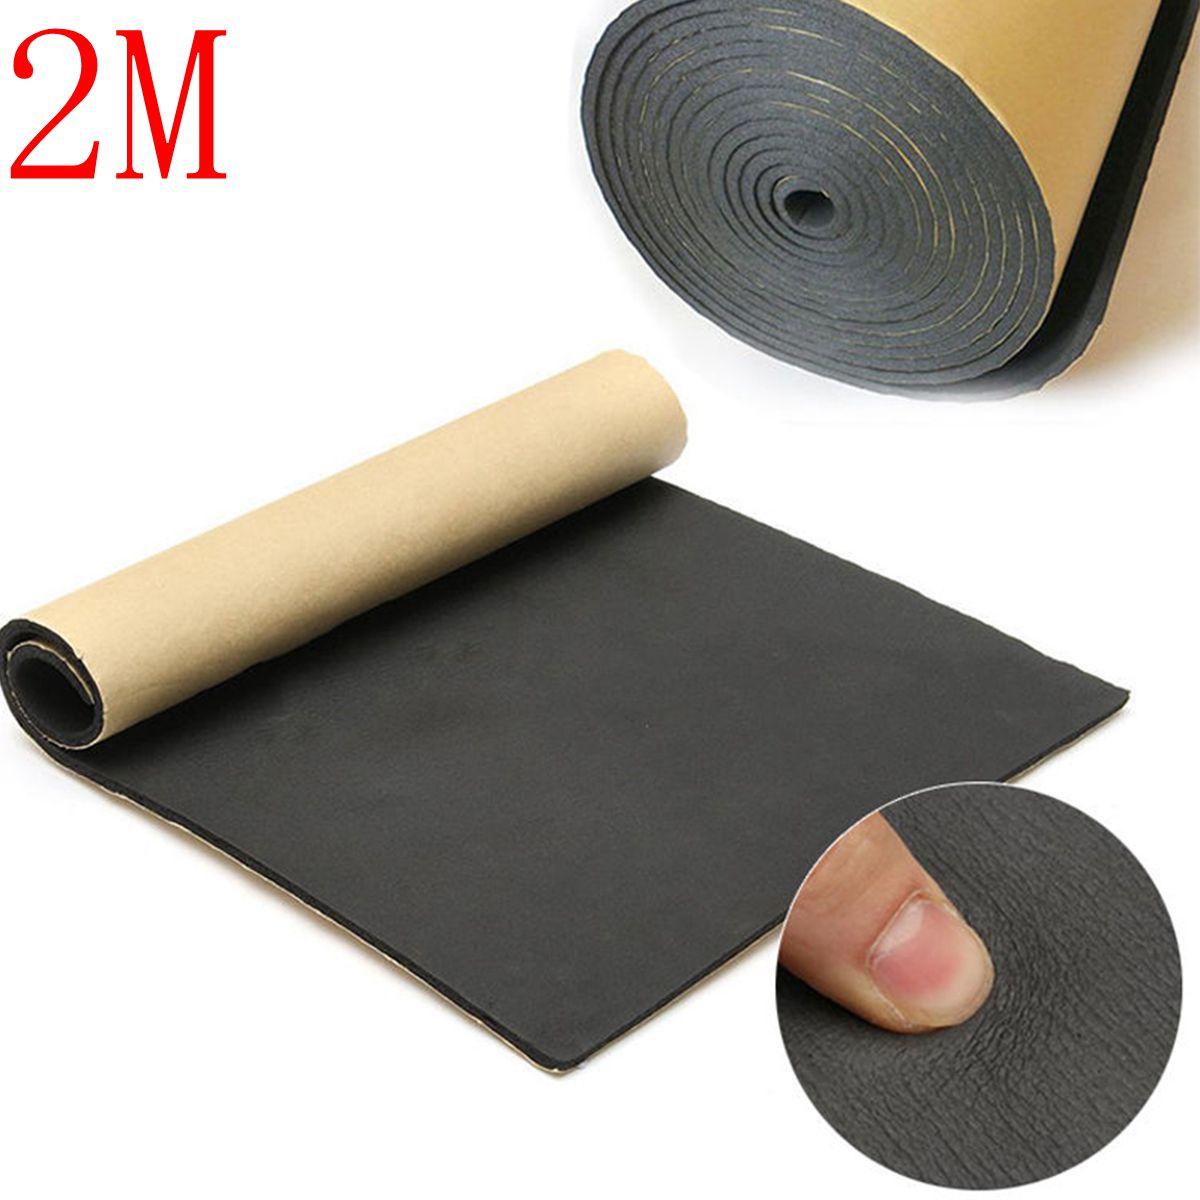 1x2M Thickness 3mm SoundProofing Acoustic Foam Treatment Sound-absorbing Cotton Noise Sponge Excellent Sound Insulation